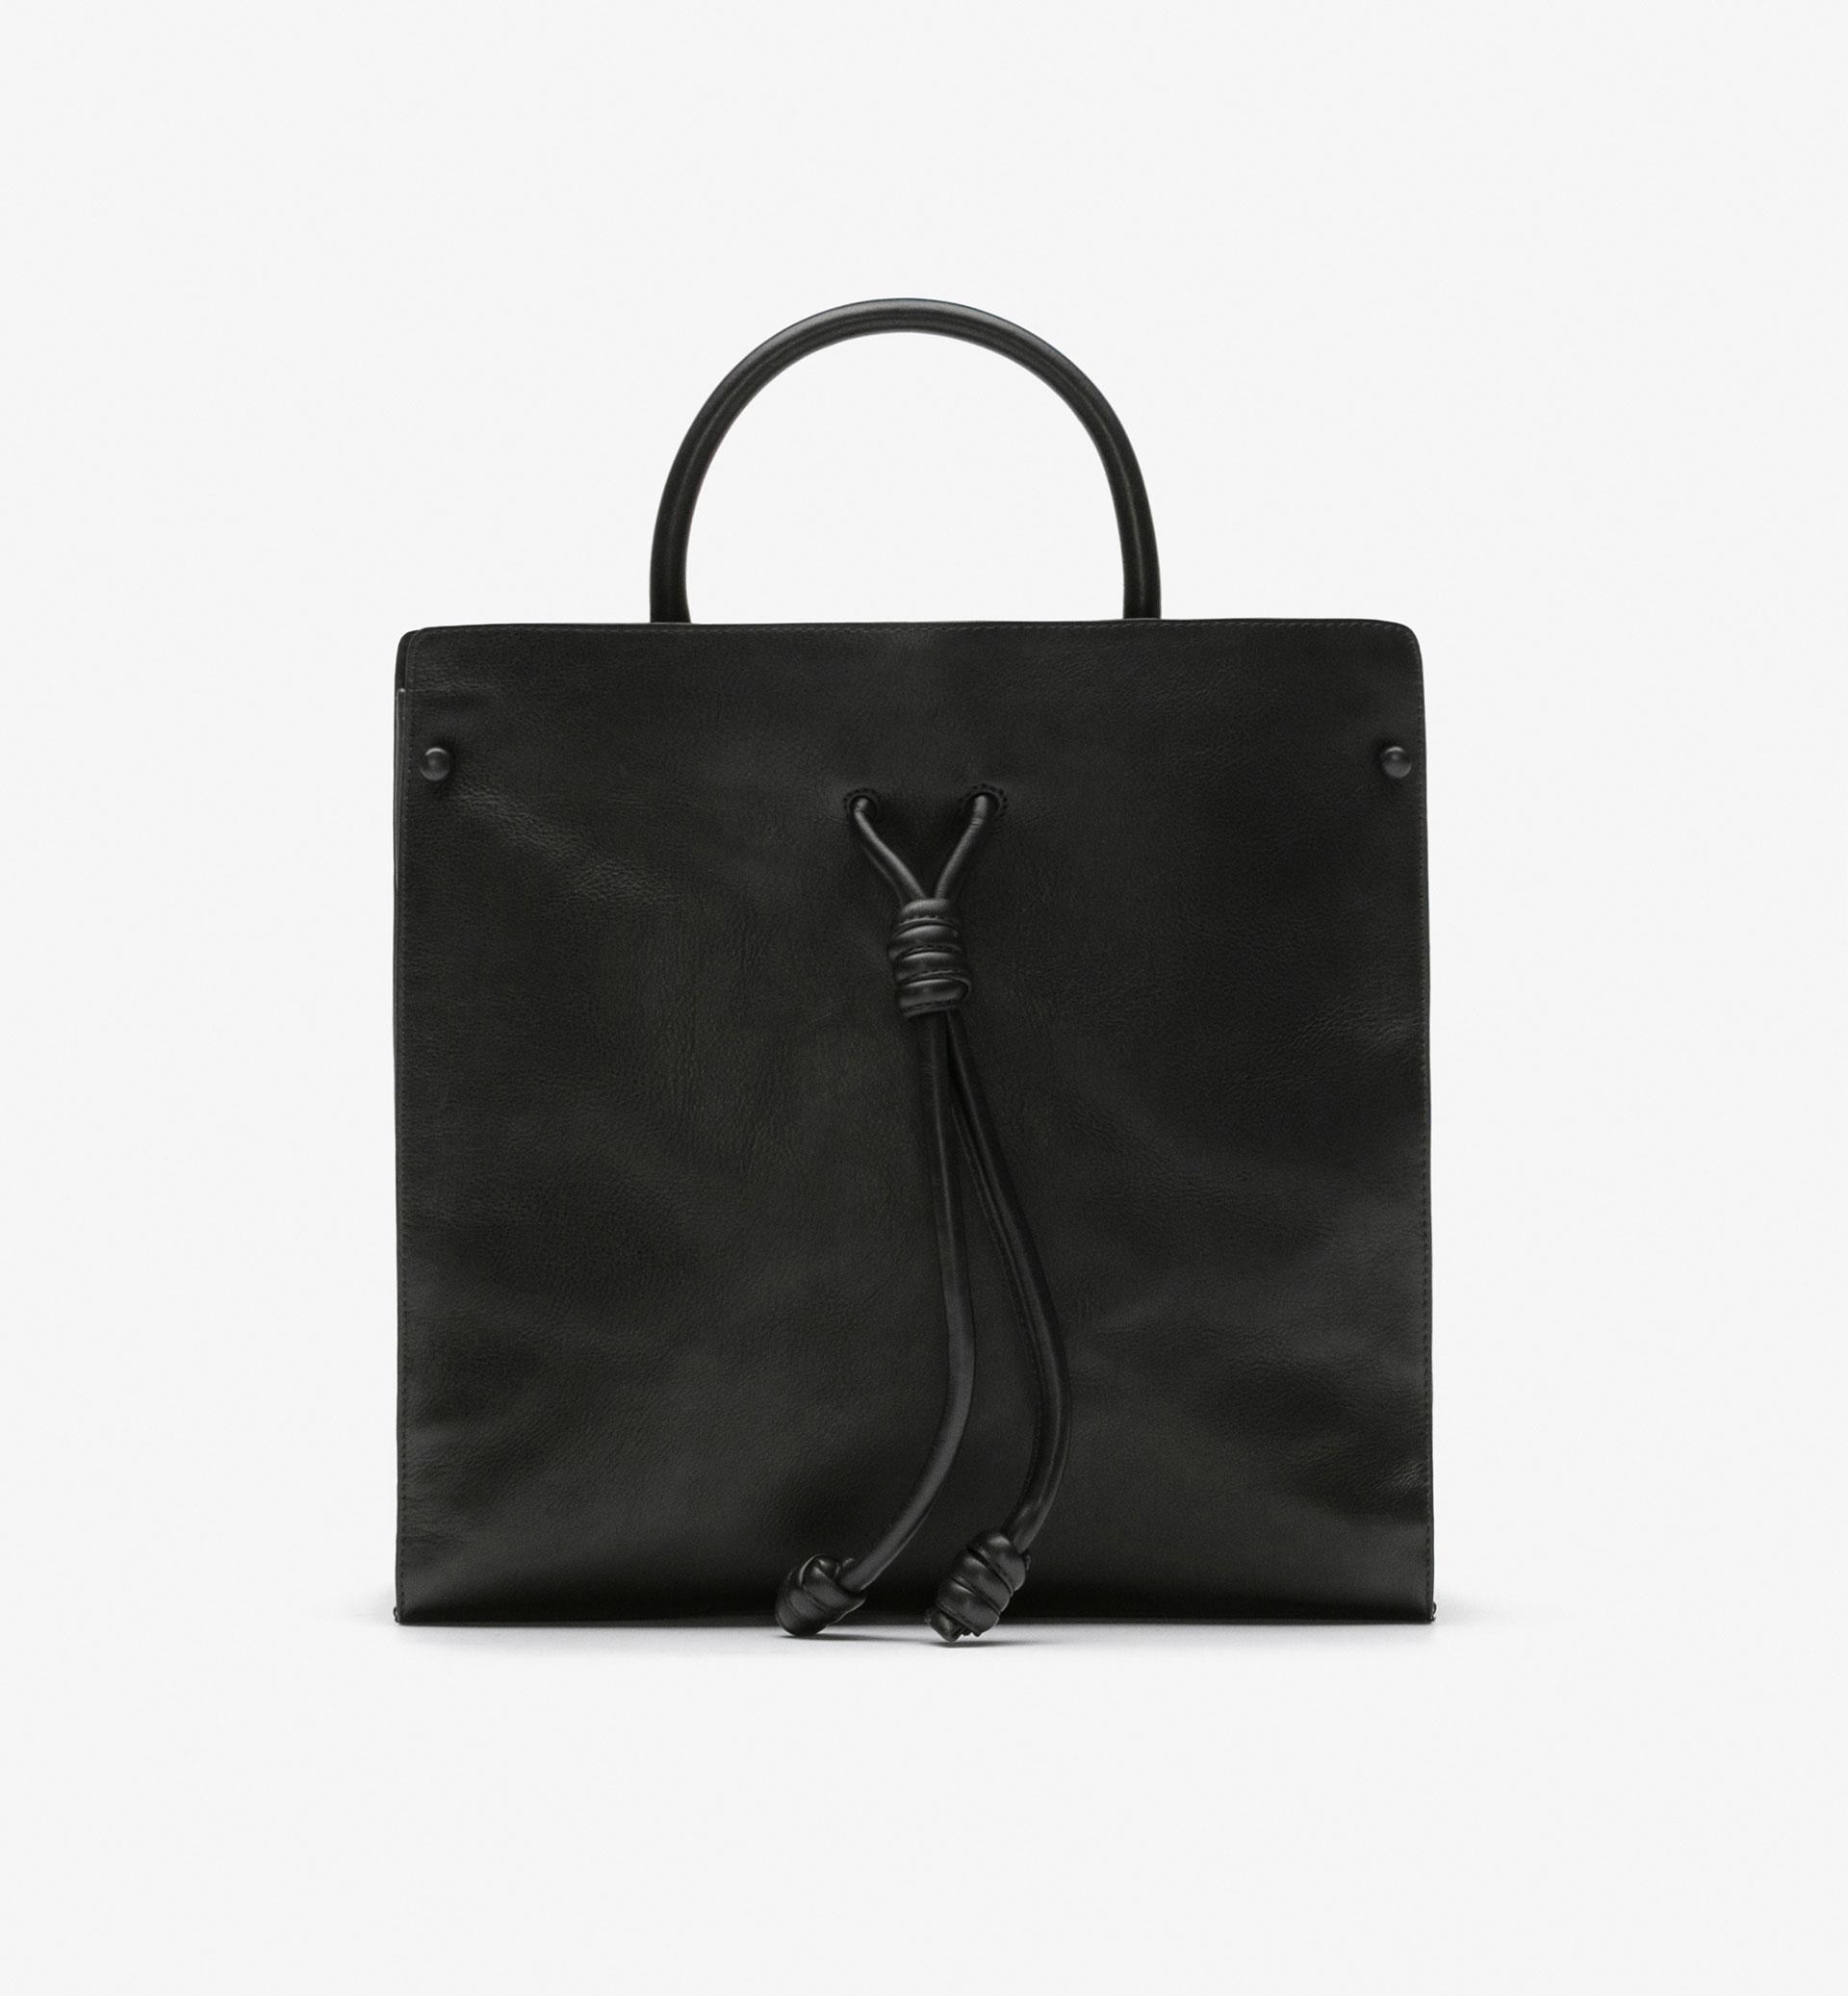 KNOT DETAIL TUBULAR BAG